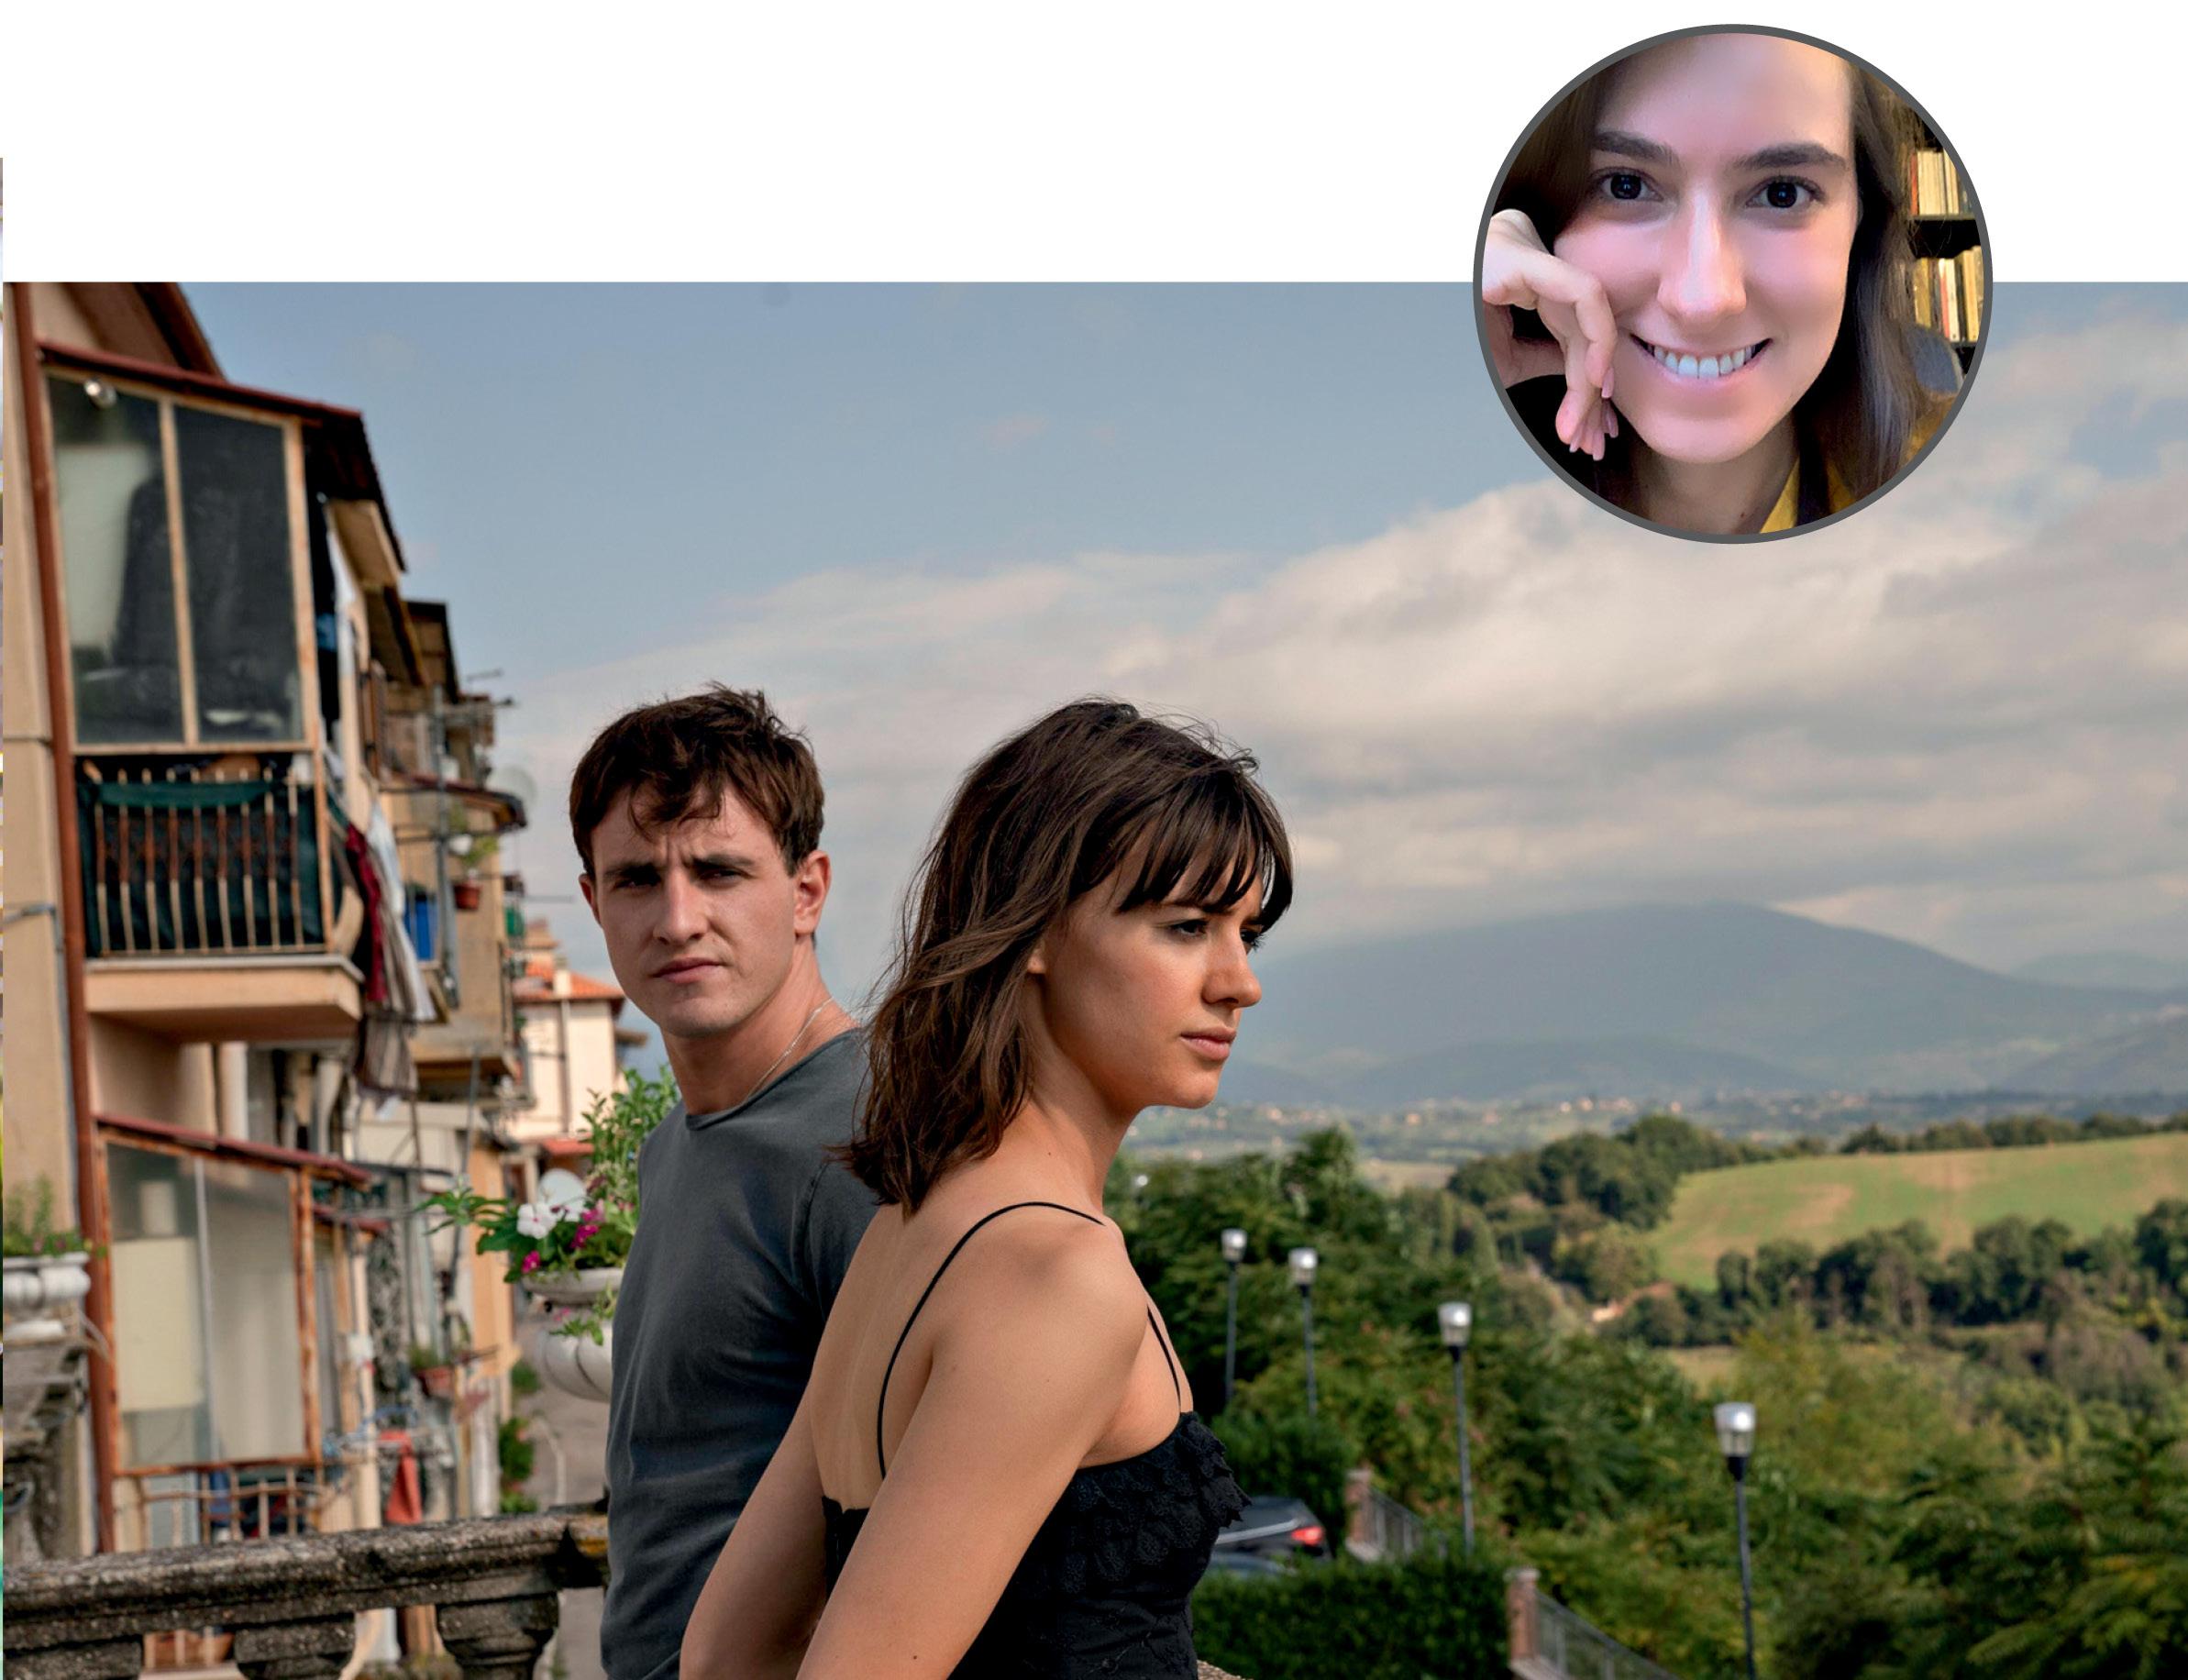 Foto de Juliene com uma imagem ilustrativa da série Normal People